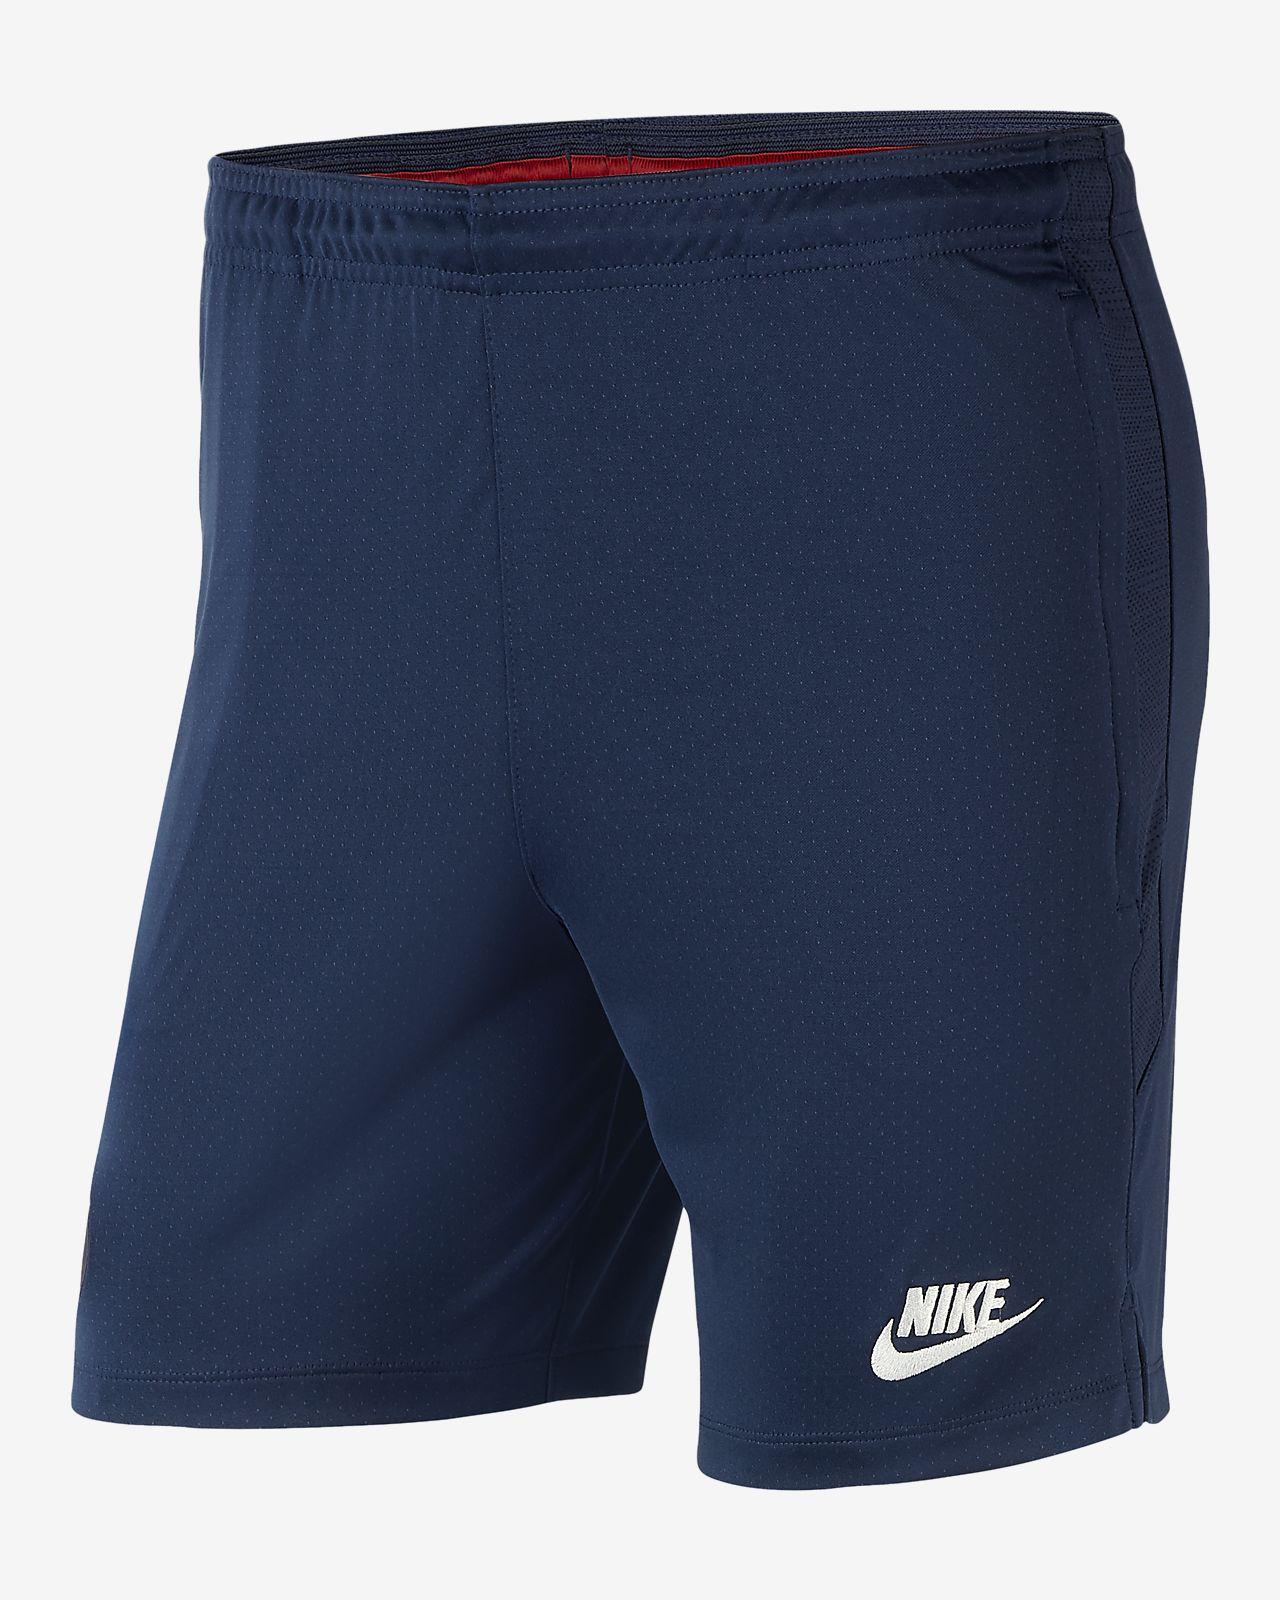 Fotbollsshorts Nike Dri-FIT Paris Saint-Germain Strike för män